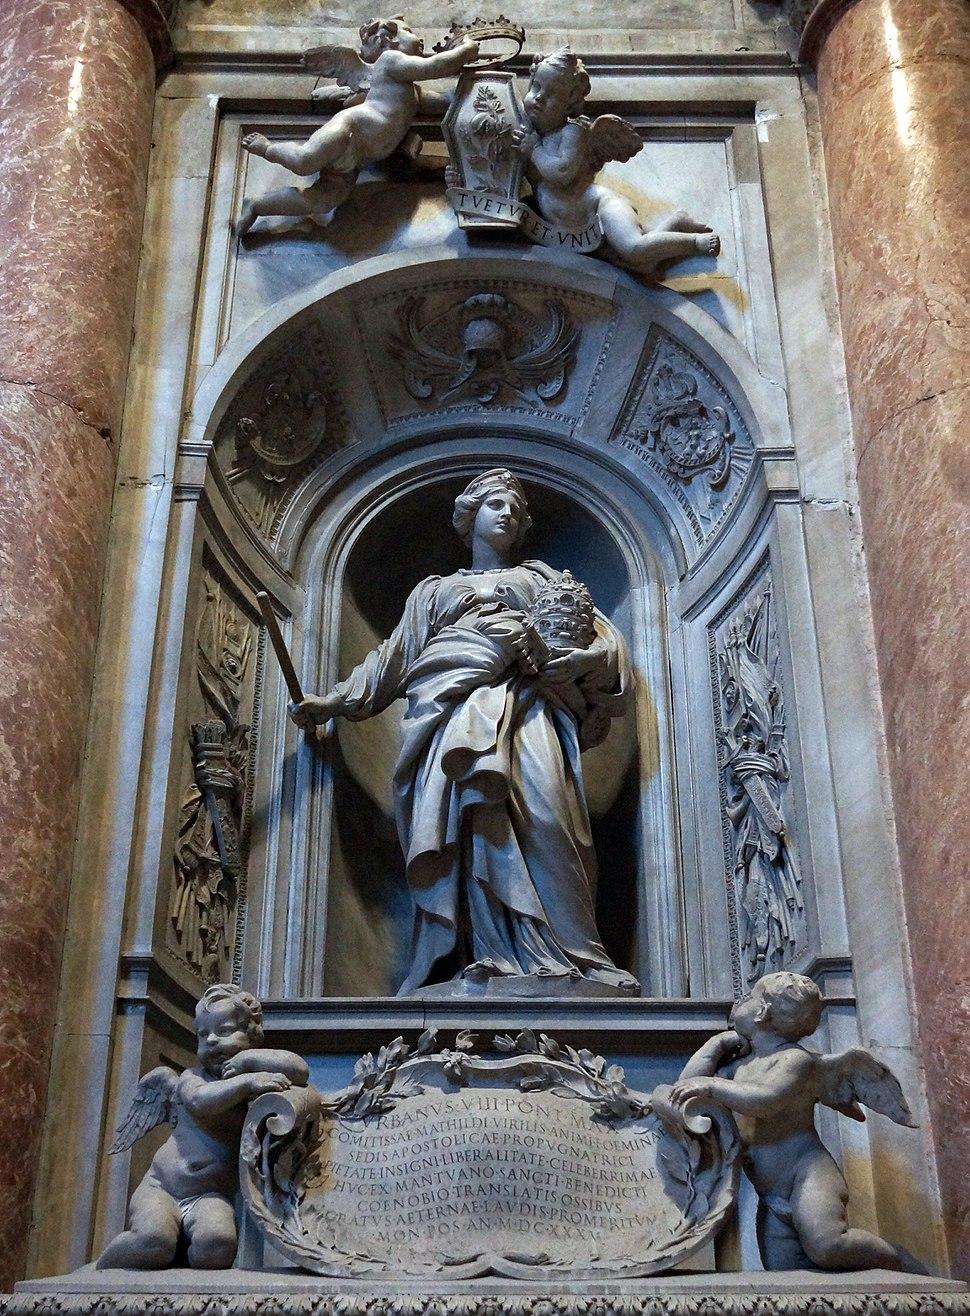 Tomb of Countess Matilda of Tuscany by Gian Lorenzo Bernini